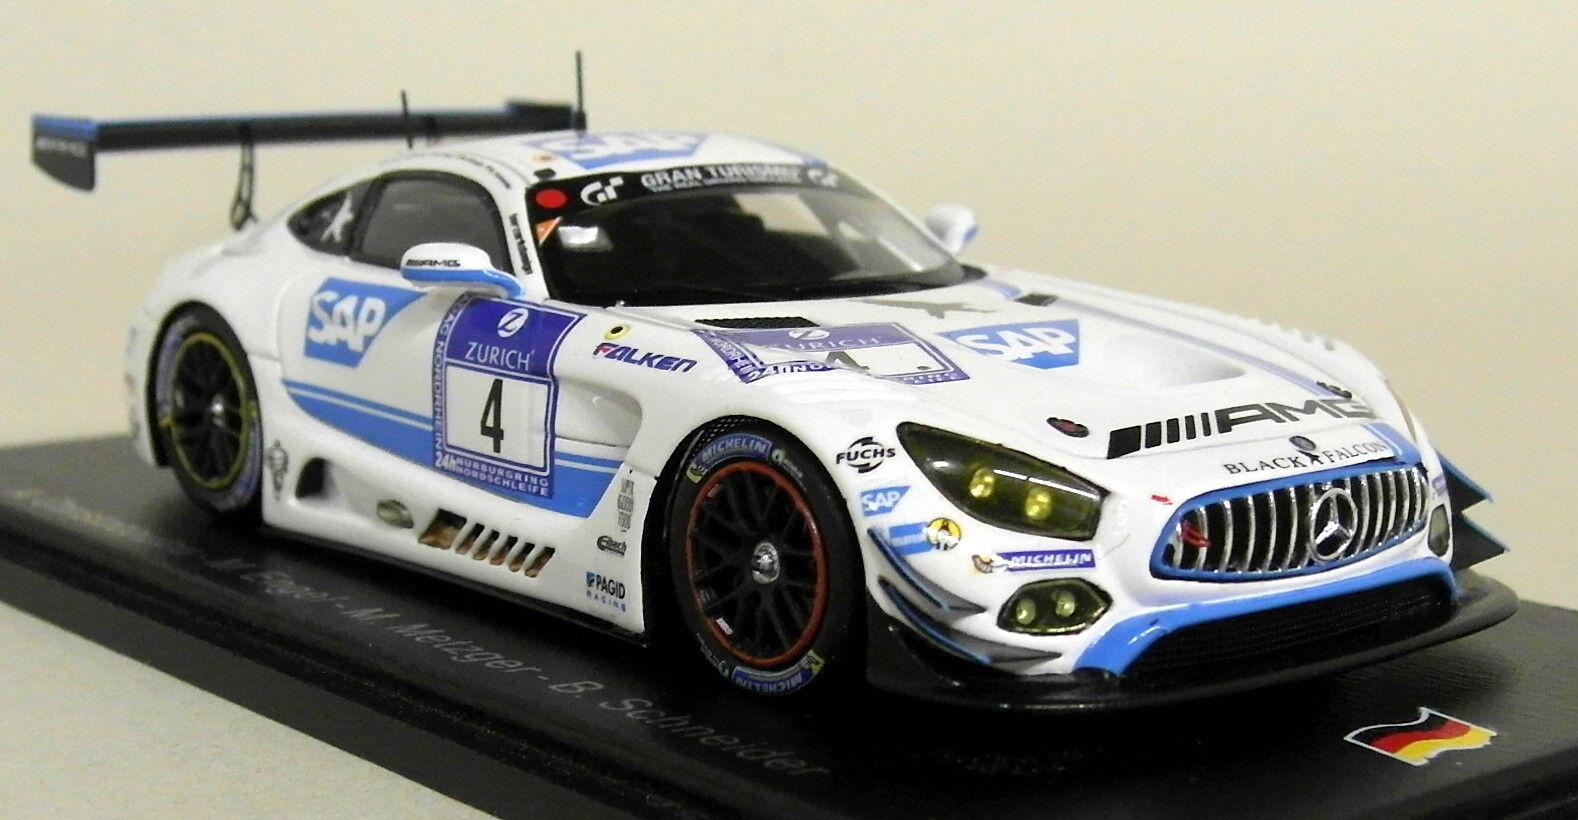 Spark 1 43 Scale SG231 Mercedes AMG GT3 Winner Nurburgring 2016 Resin Model Car